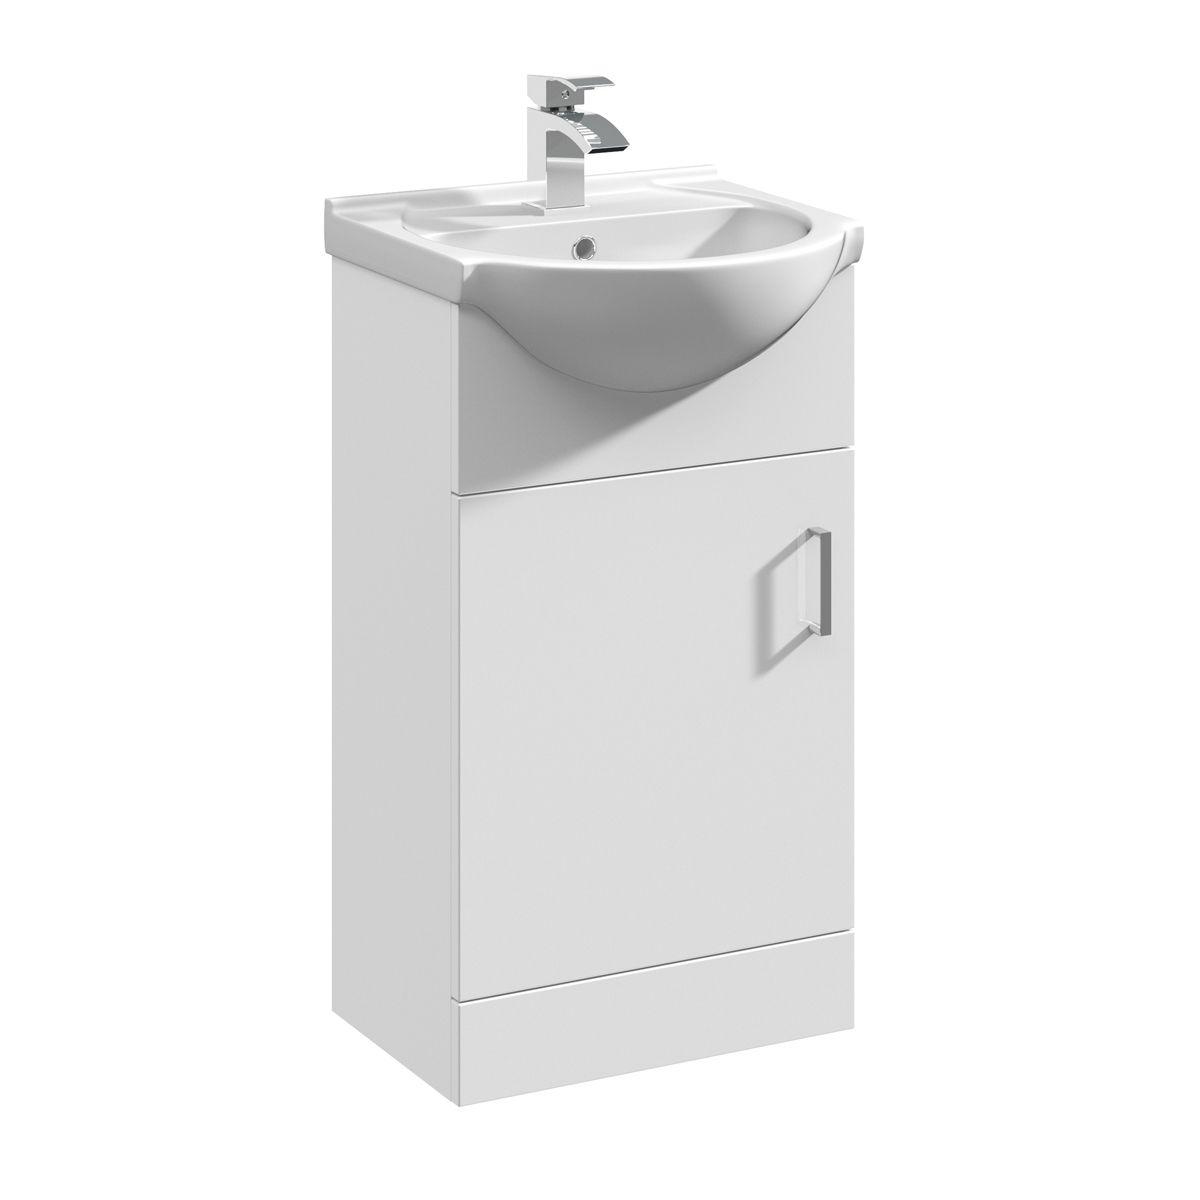 Nuie High Gloss White Vanity Unit 450mm